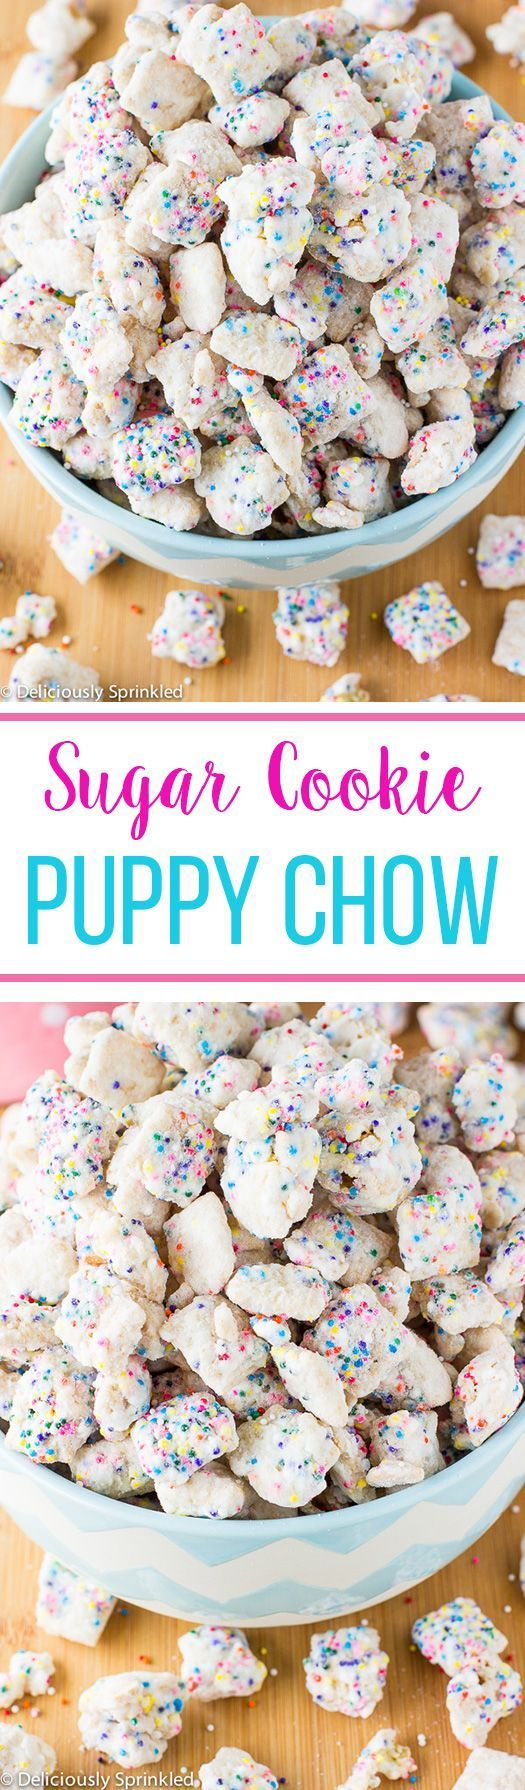 No-Bake Sugar Cookie Puppy Chow Recipe